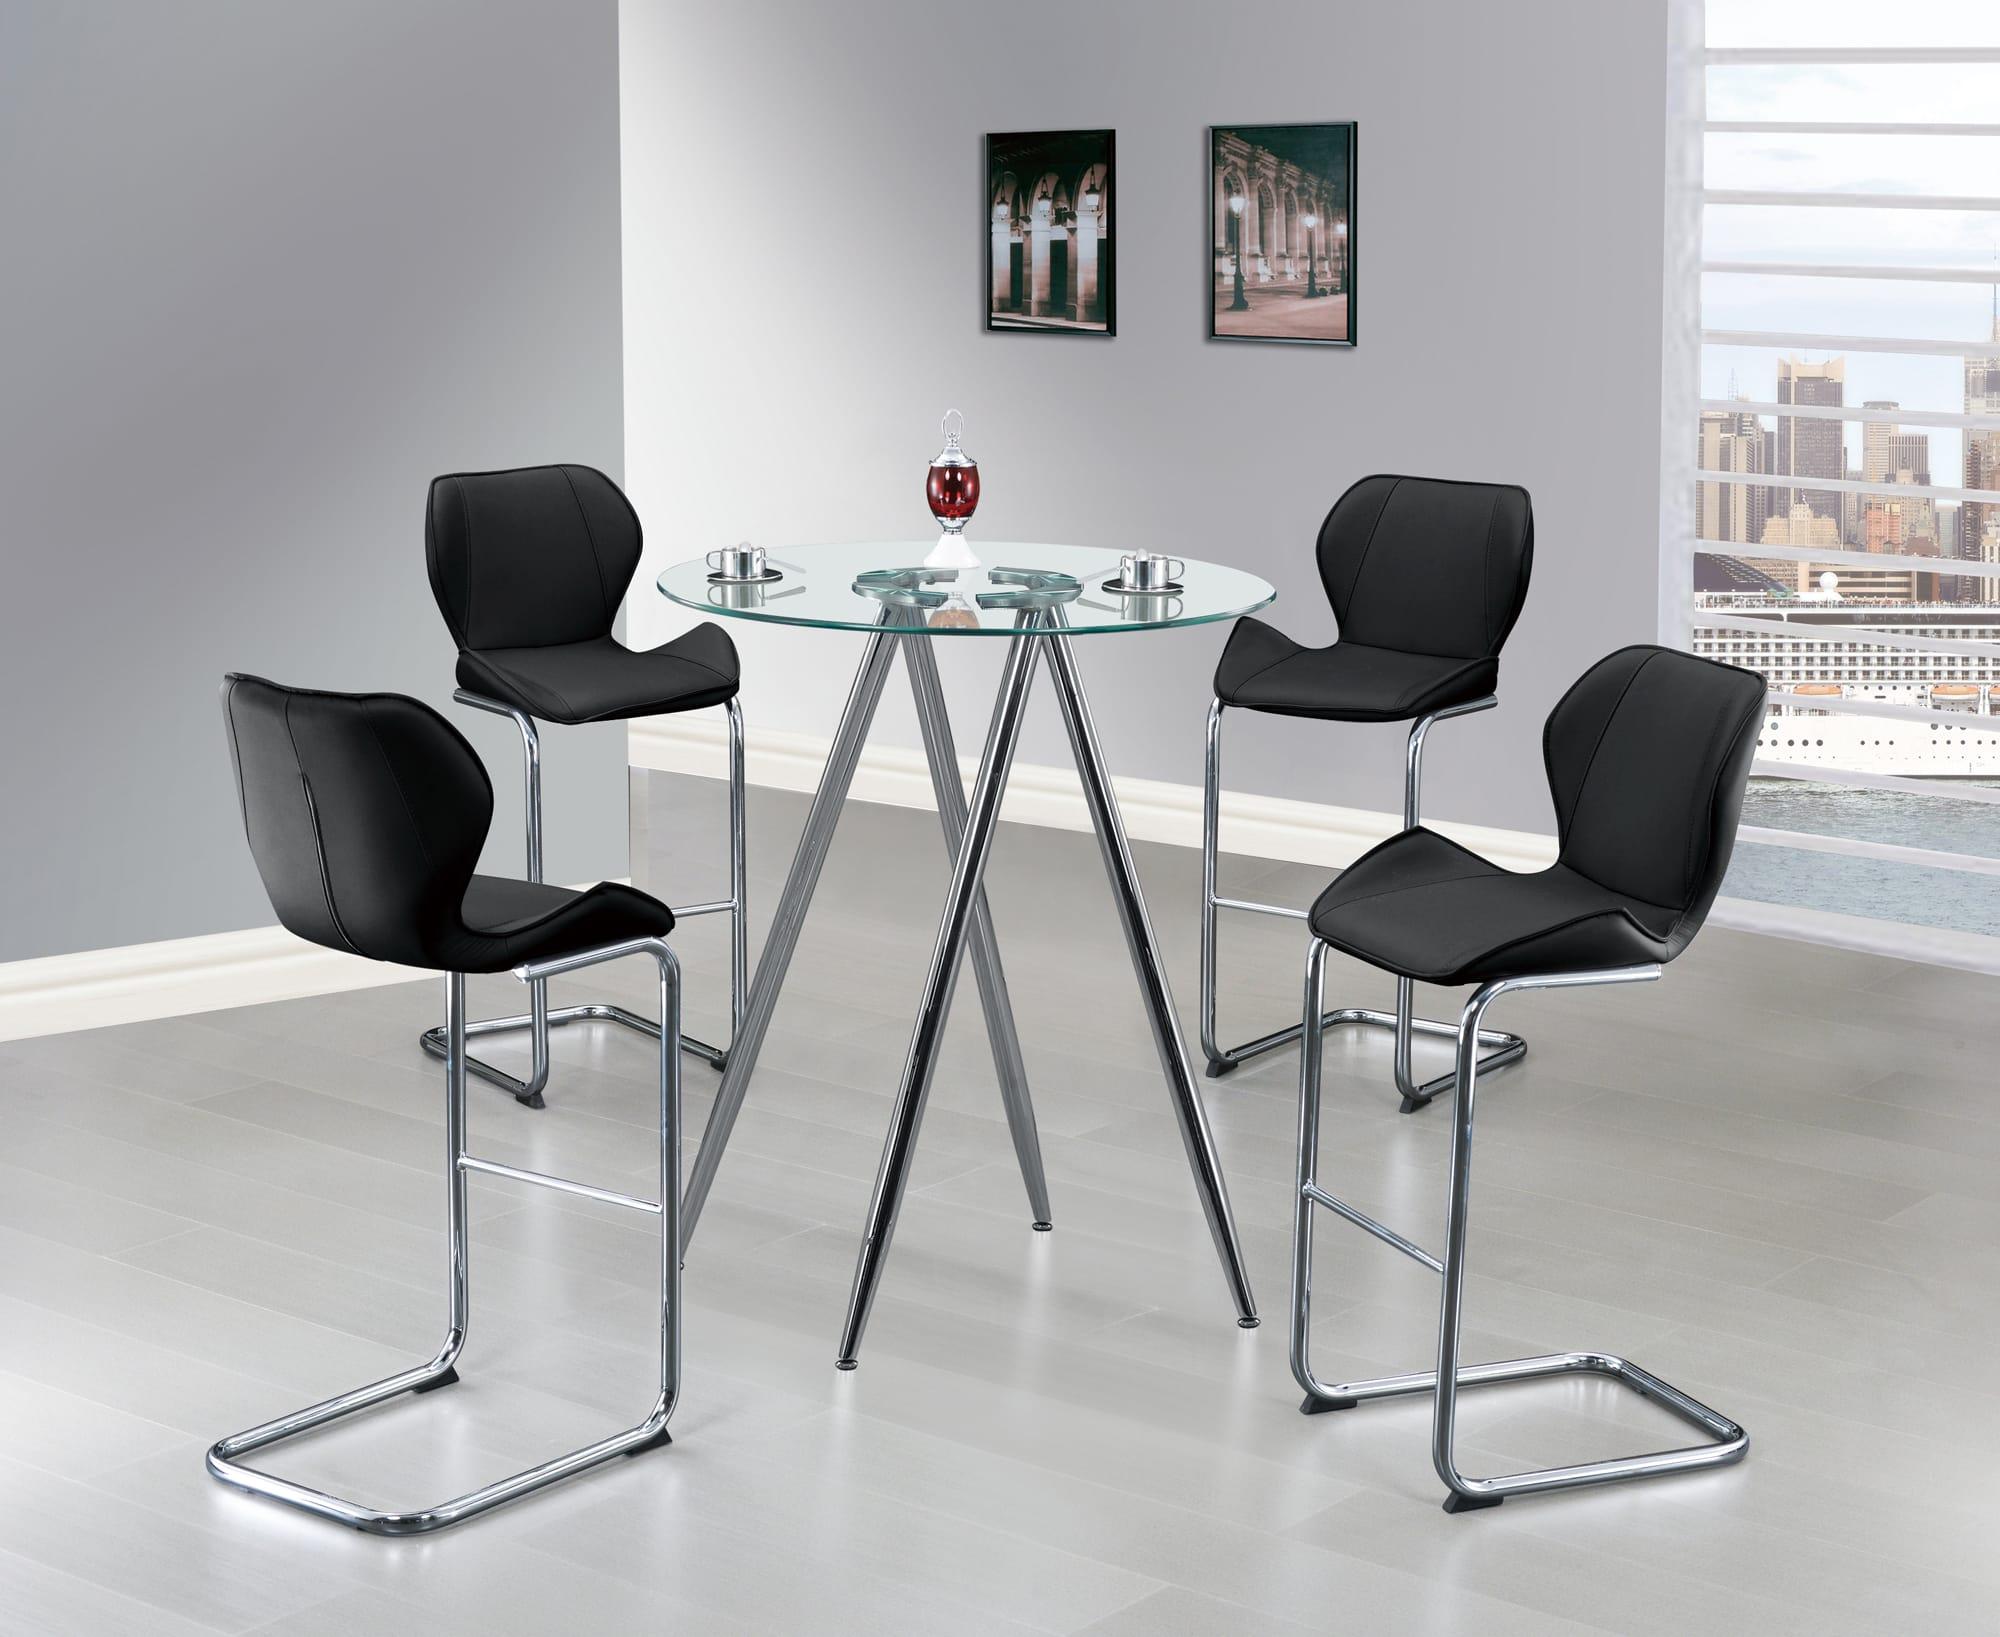 Bar Table D1503 by Global Furniture : D1503BT from futonland.com size 2000 x 1637 jpeg 1613kB